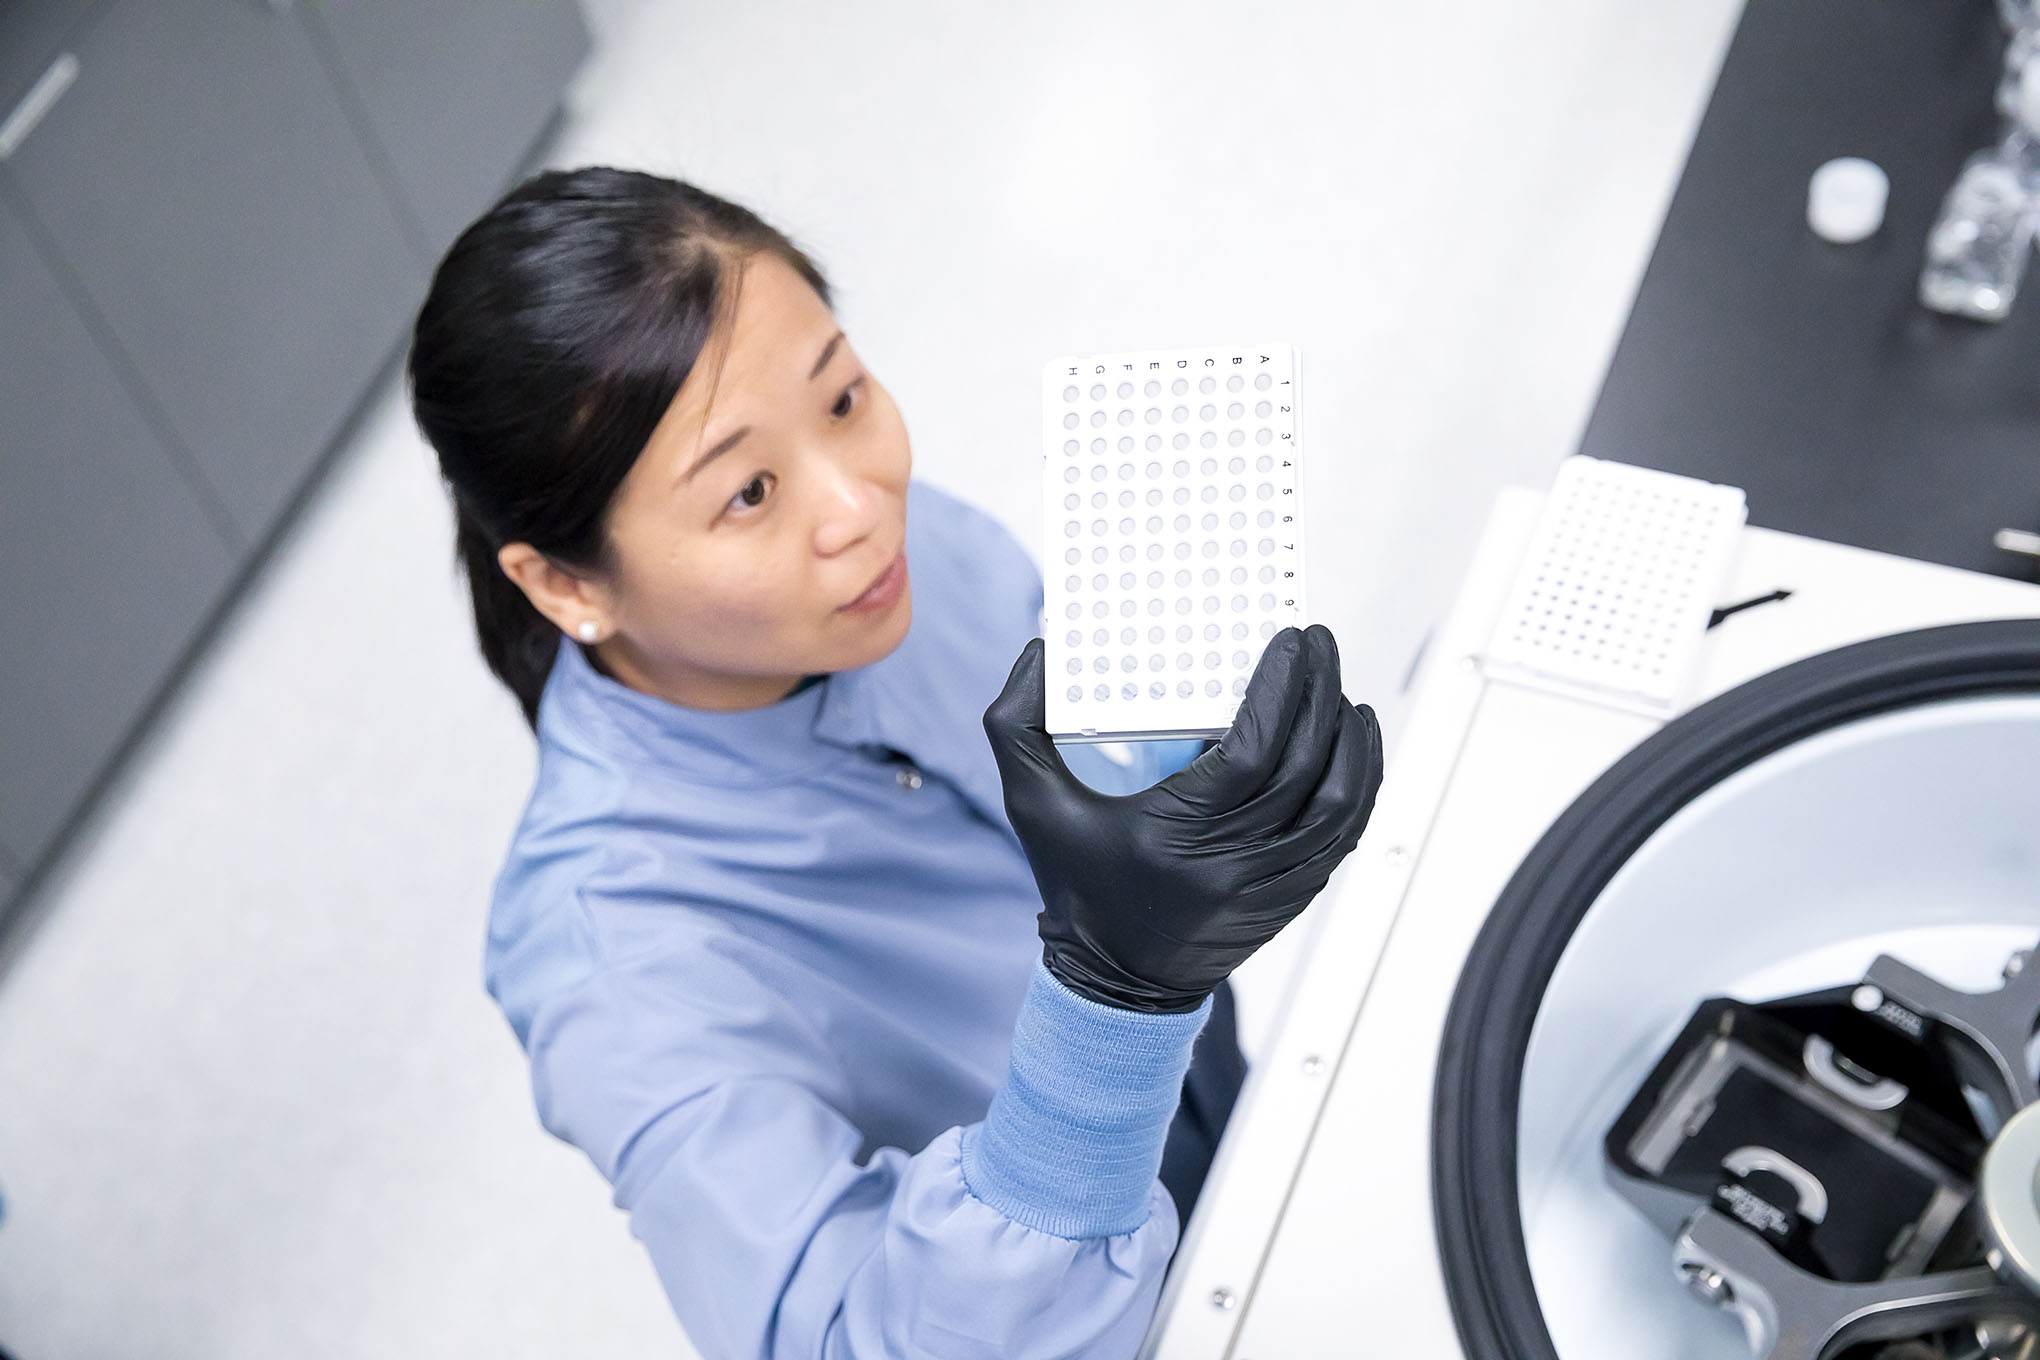 Helix sample examination